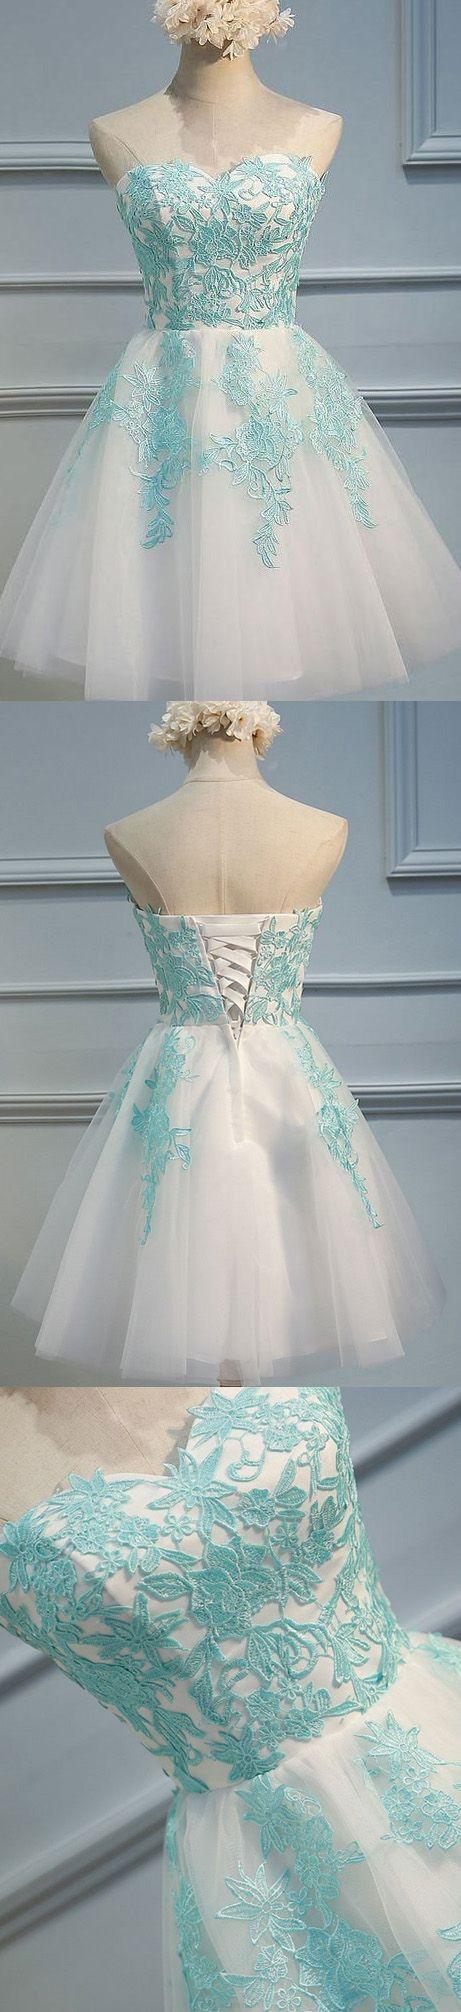 Sleeveless Party Dresses, Ivory Sleeveless Party Dresses, Short ...